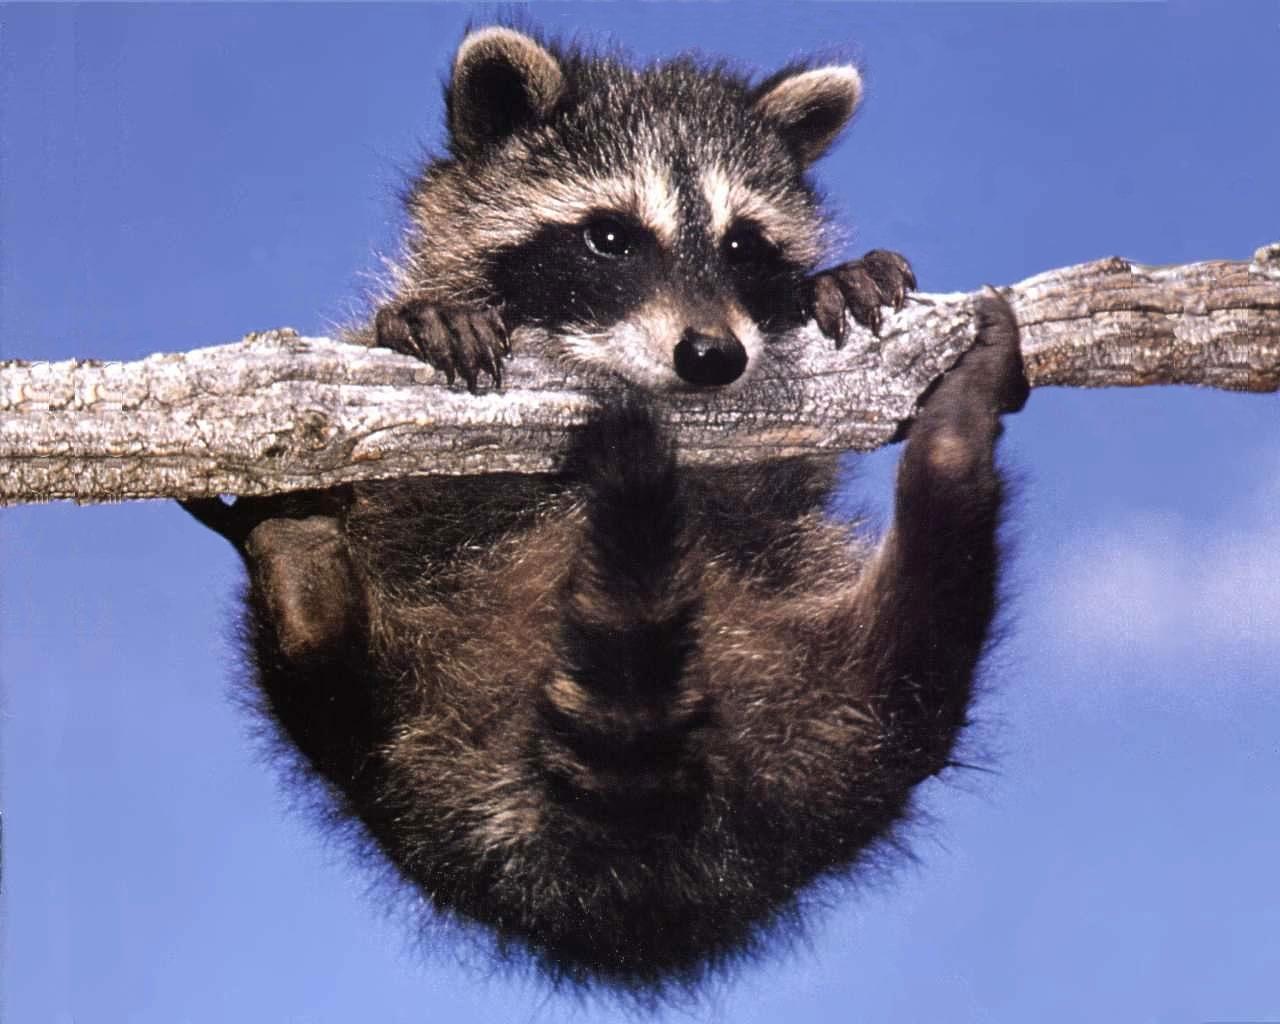 Cute Initial Wallpaper Raccoon Intelligent Thief Animal Photo